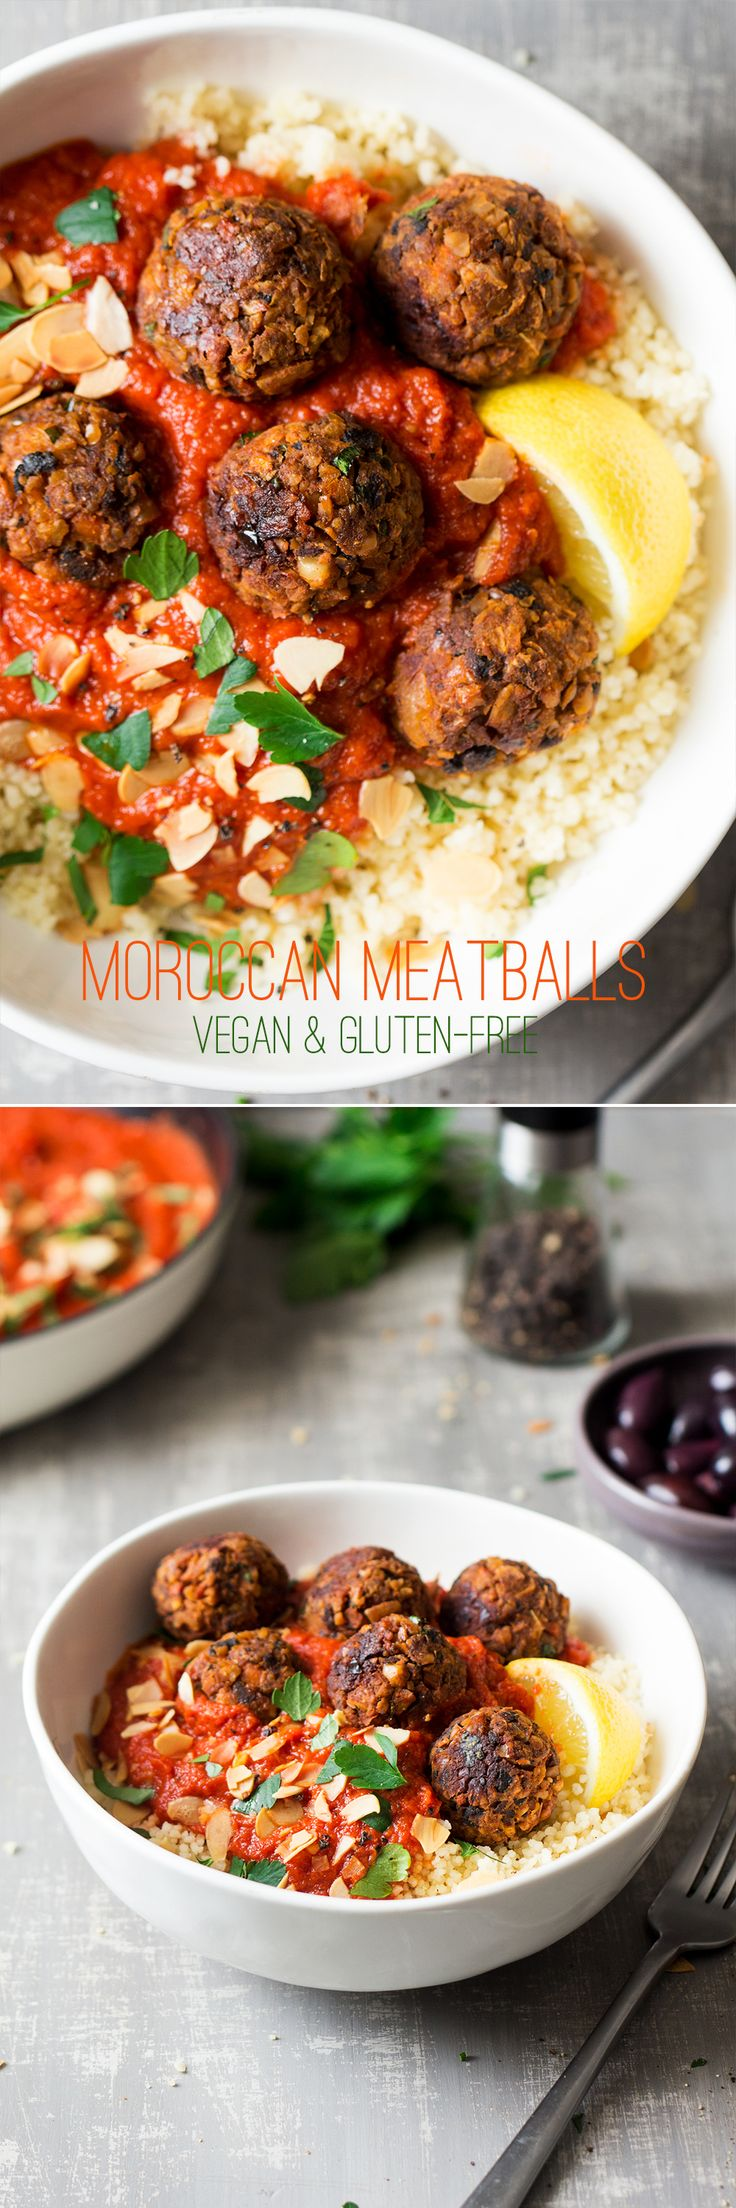 #vegan #meatballs #neatballs #veganmeatballs #glutenfree #moroccan #dinner #lunch #entree #healthy #baked #chickpeas